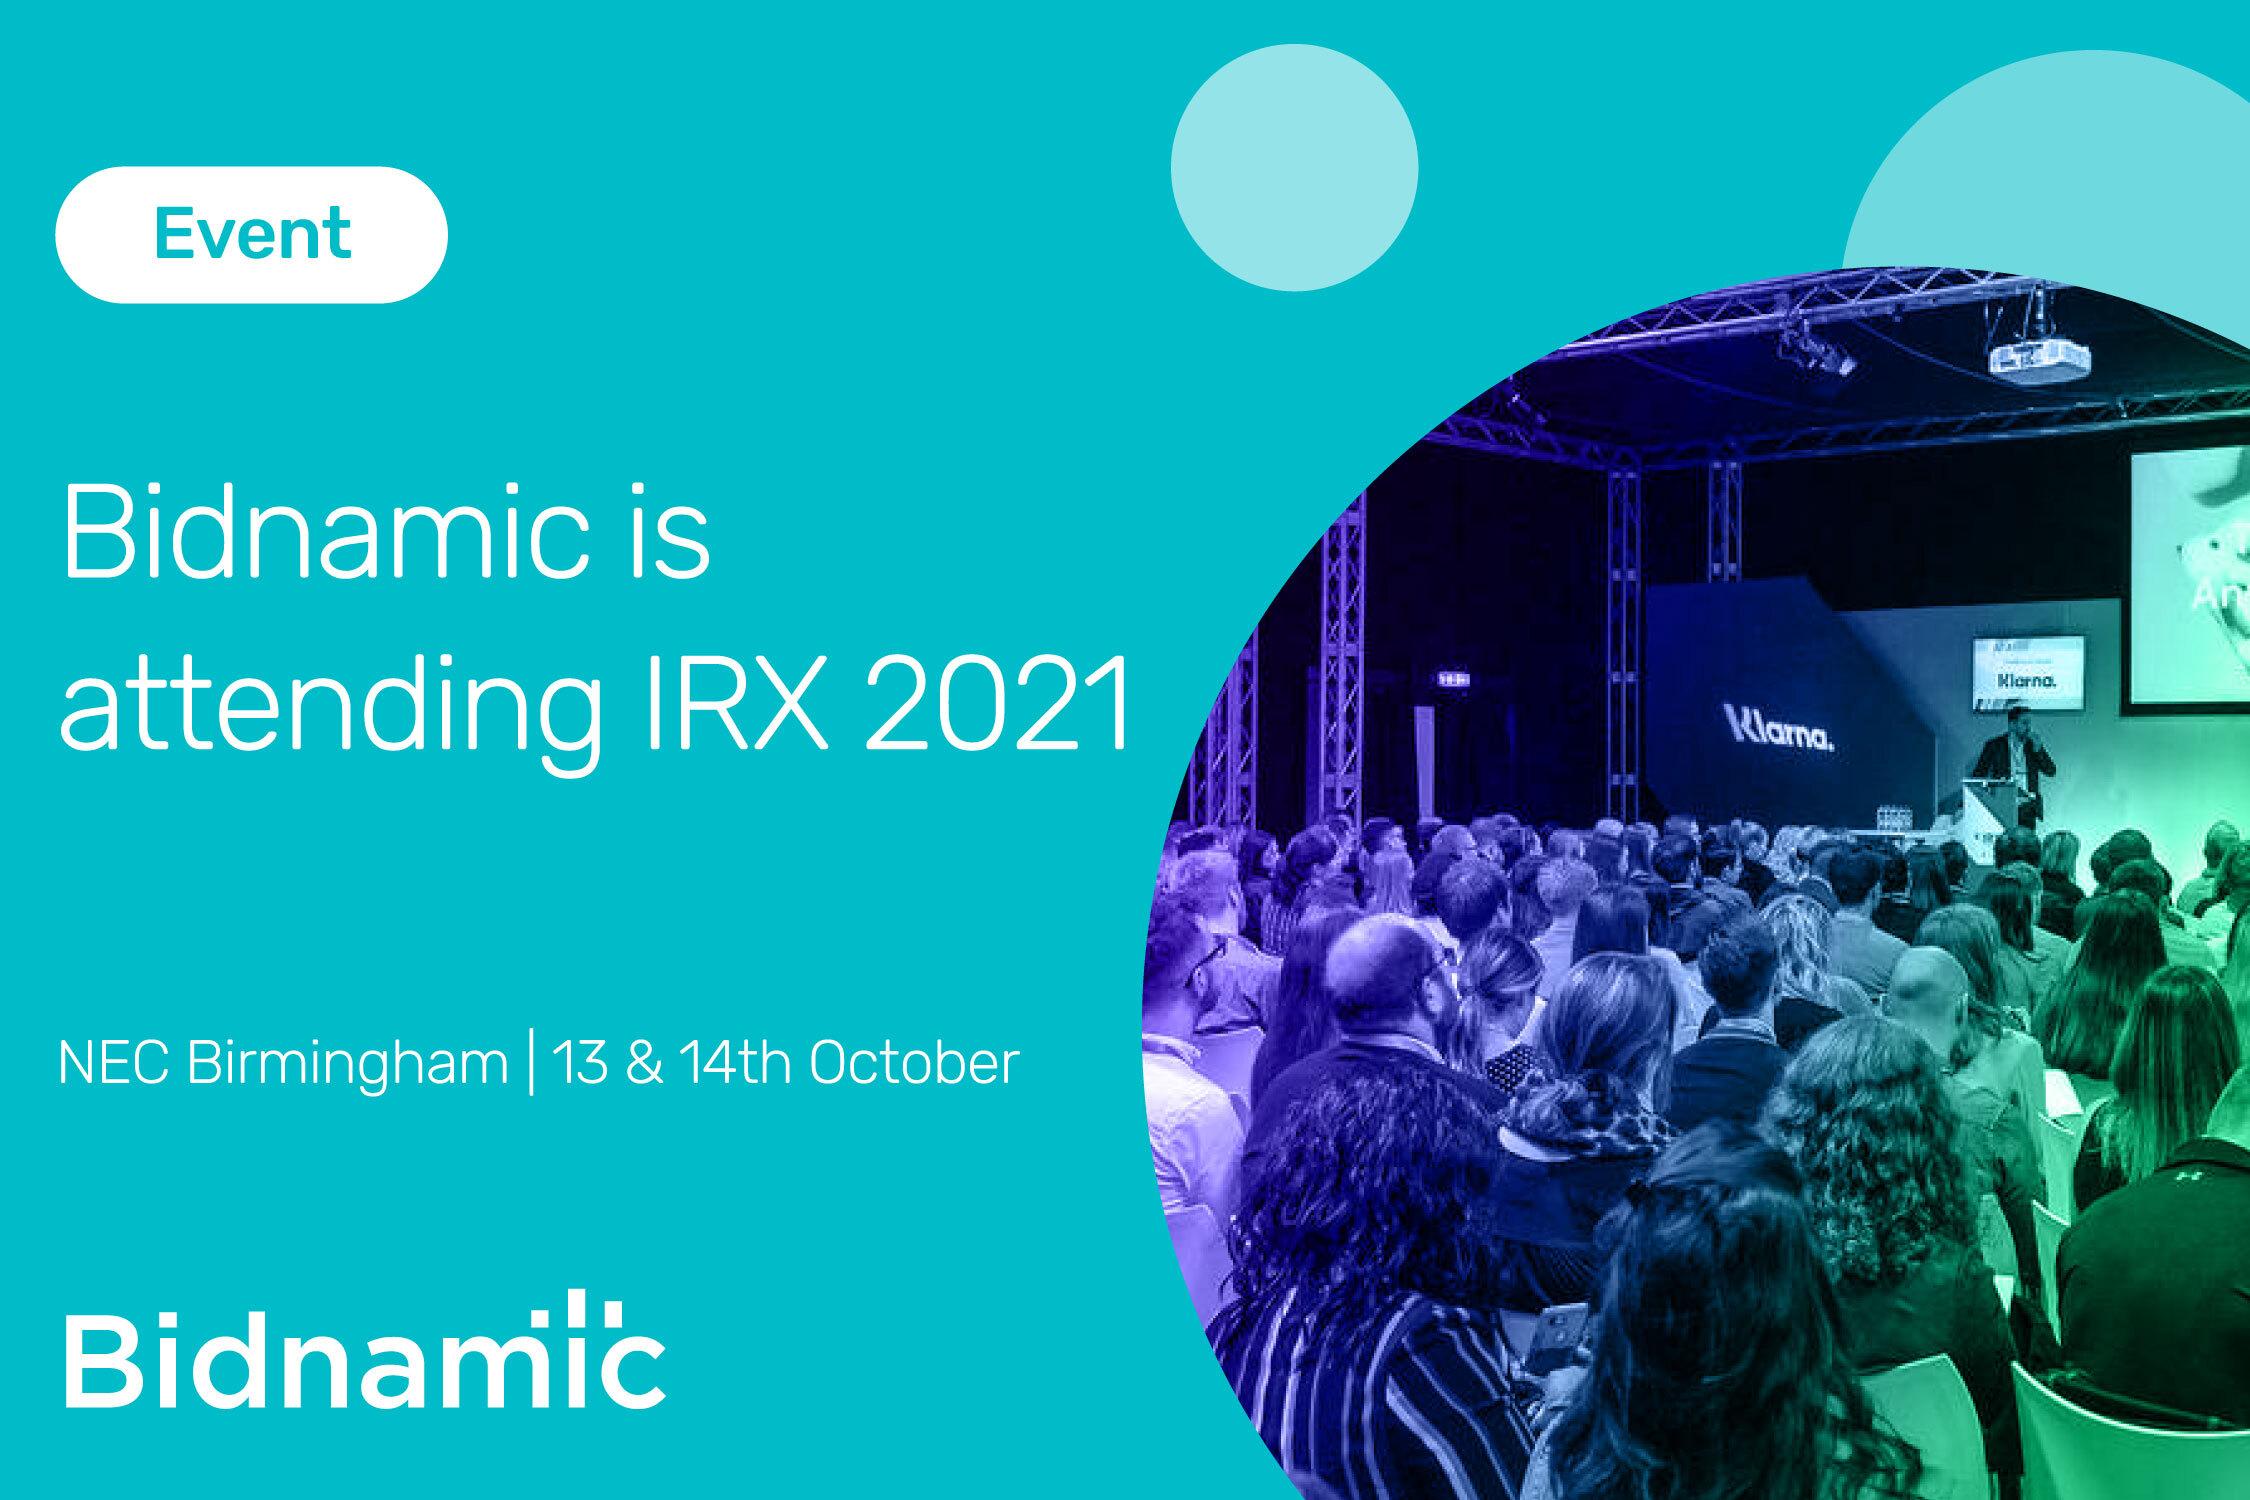 Events: Bidnamic is attending IRX 2021!